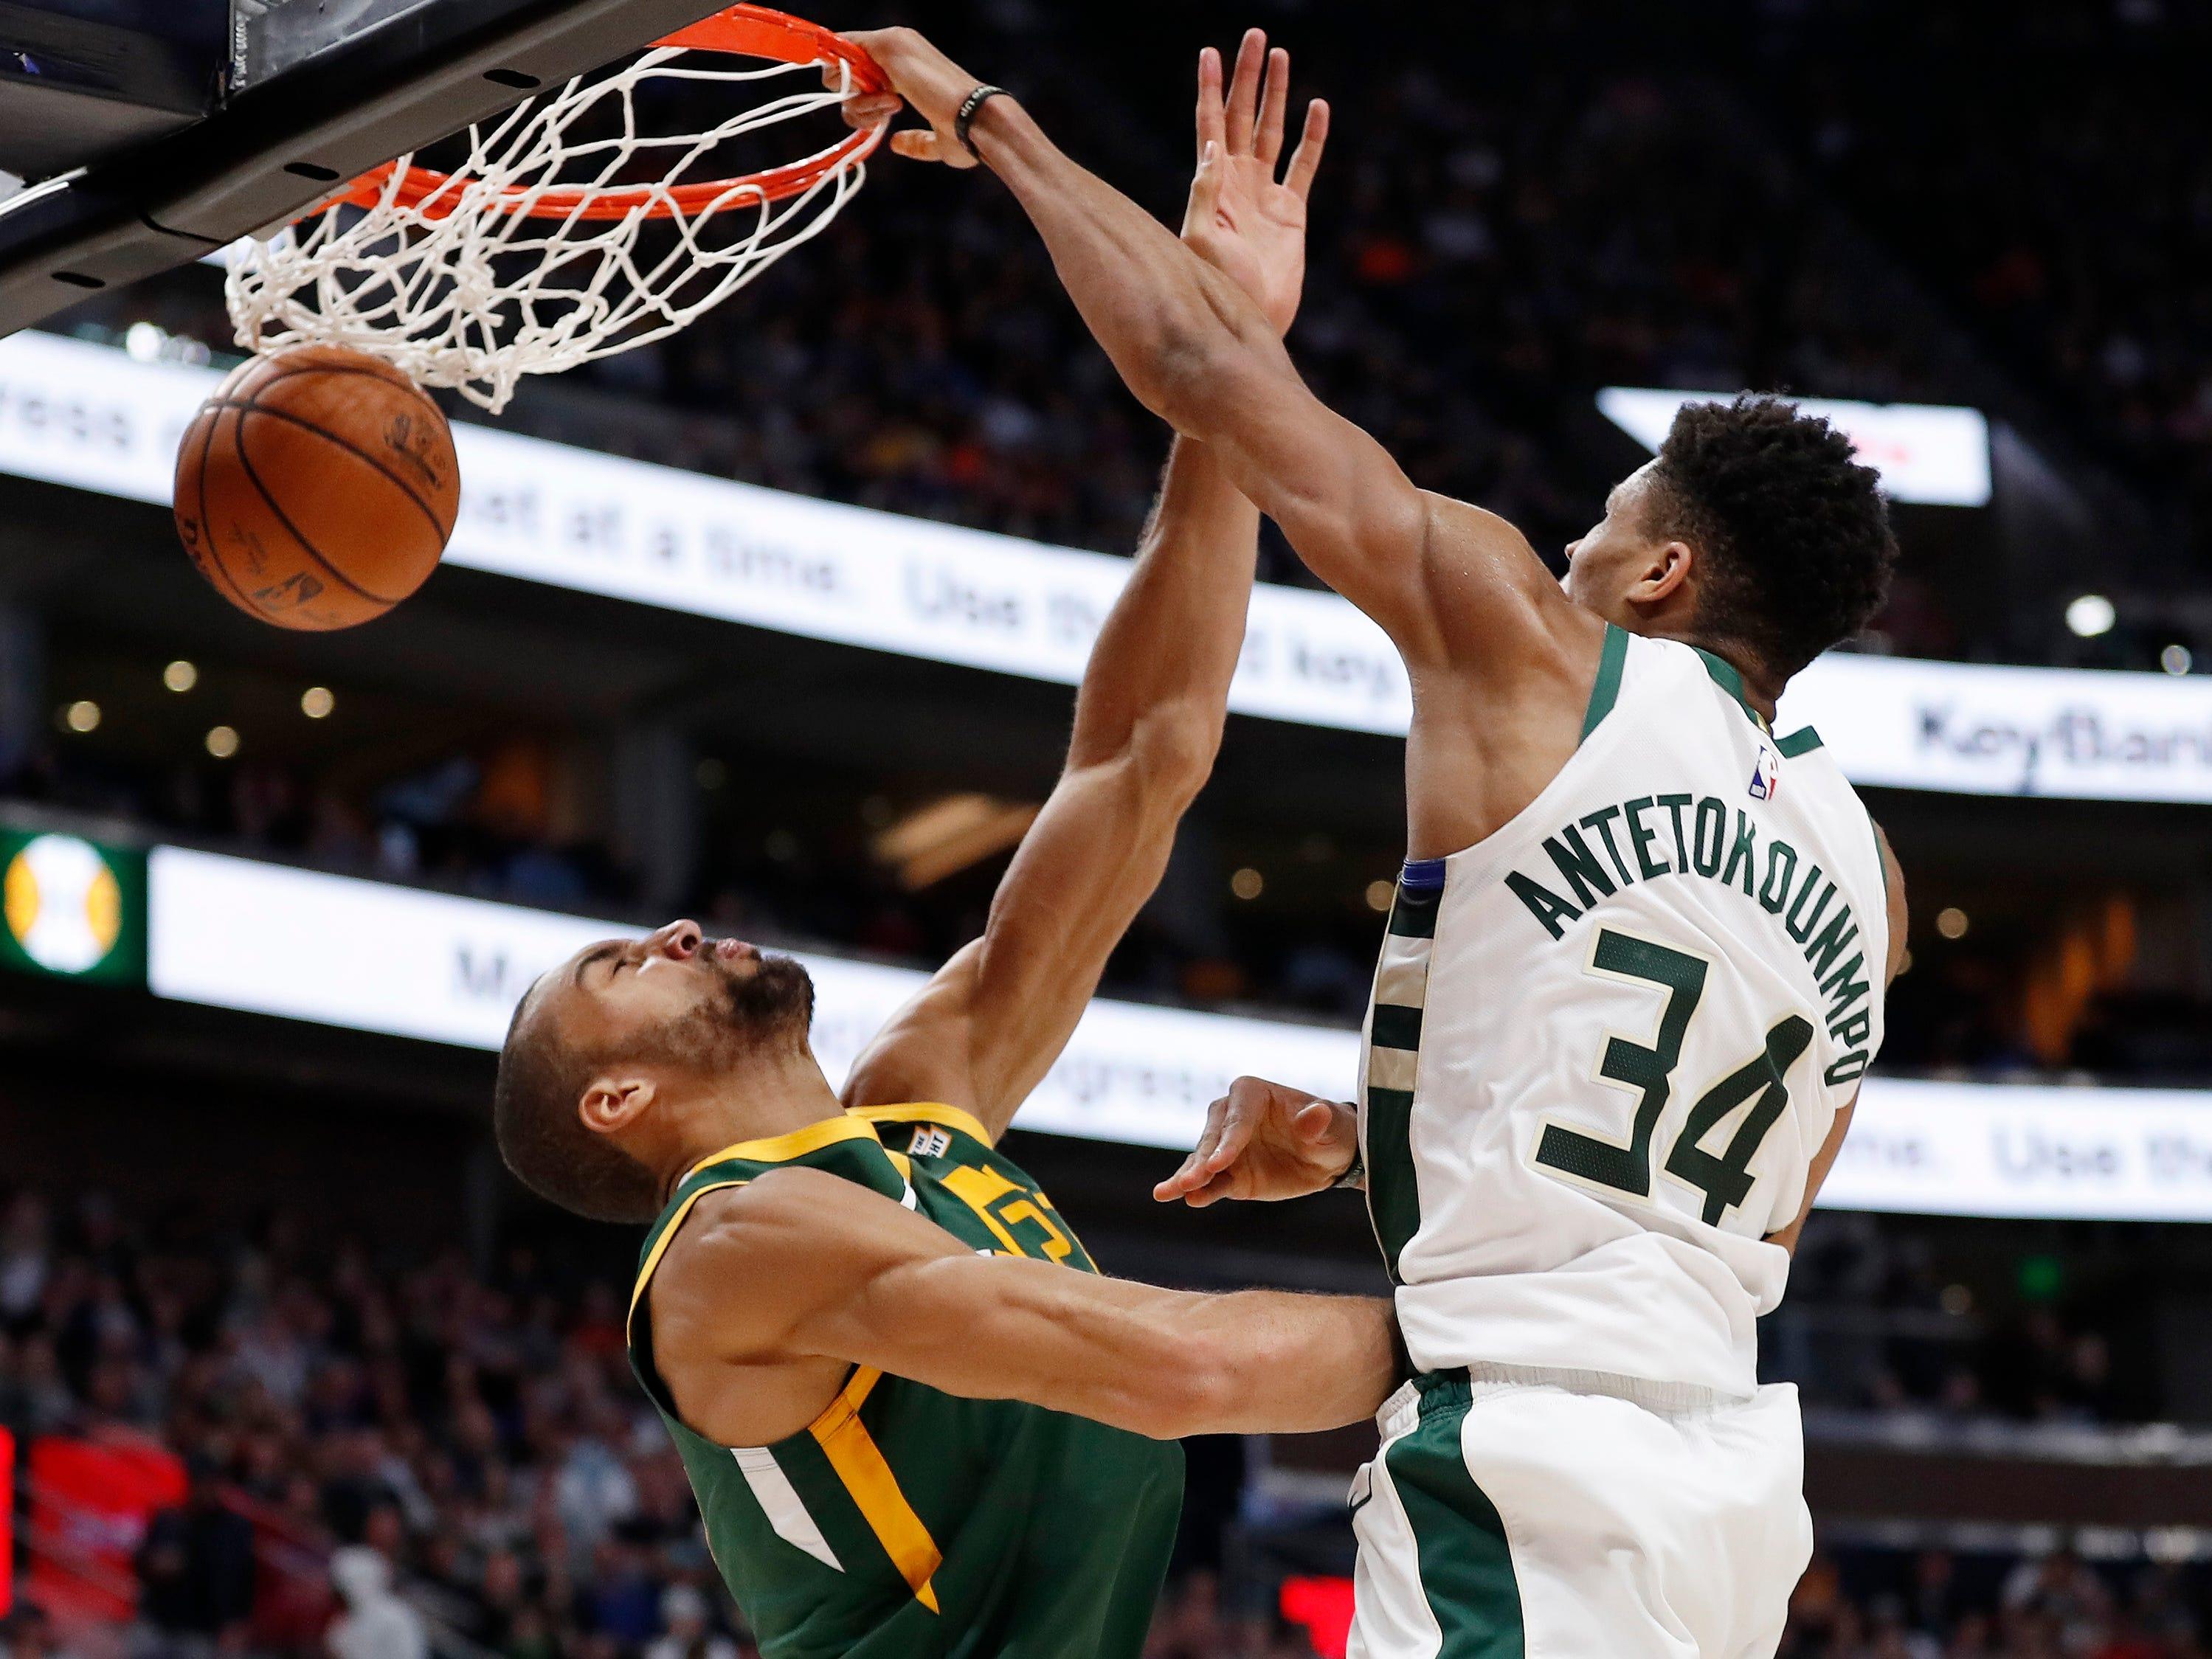 March 2: Bucks forward Giannis Antetokounmpo (34) finishes the thunderous flush over Jazz center Rudy Gobert (27) during the fourth quarter in Salt Lake City.